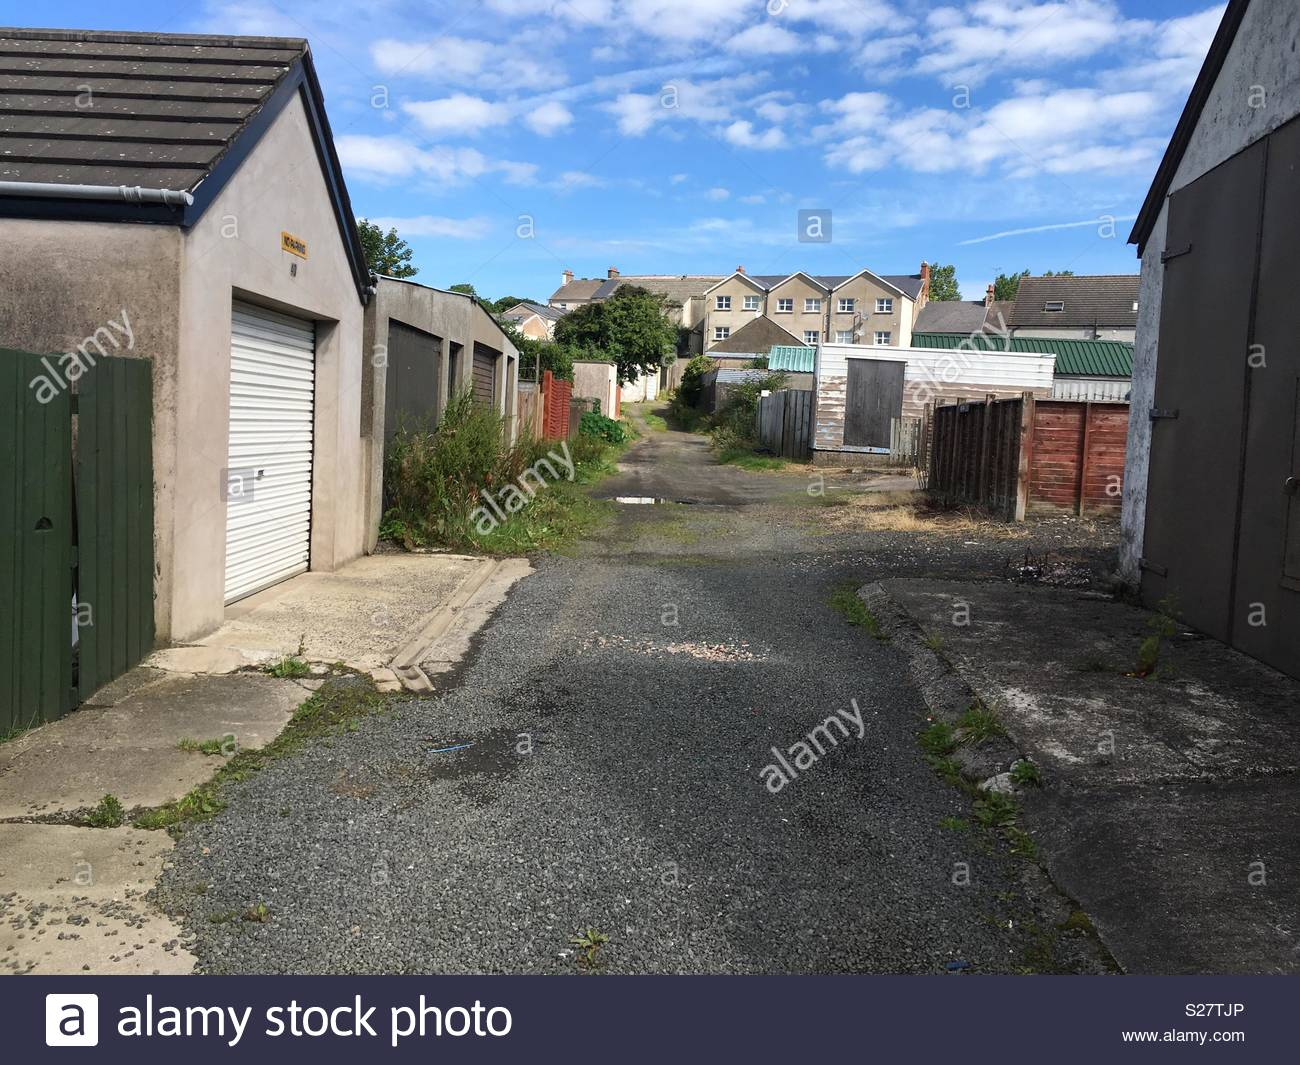 Lanes and Doorways - Stock Image